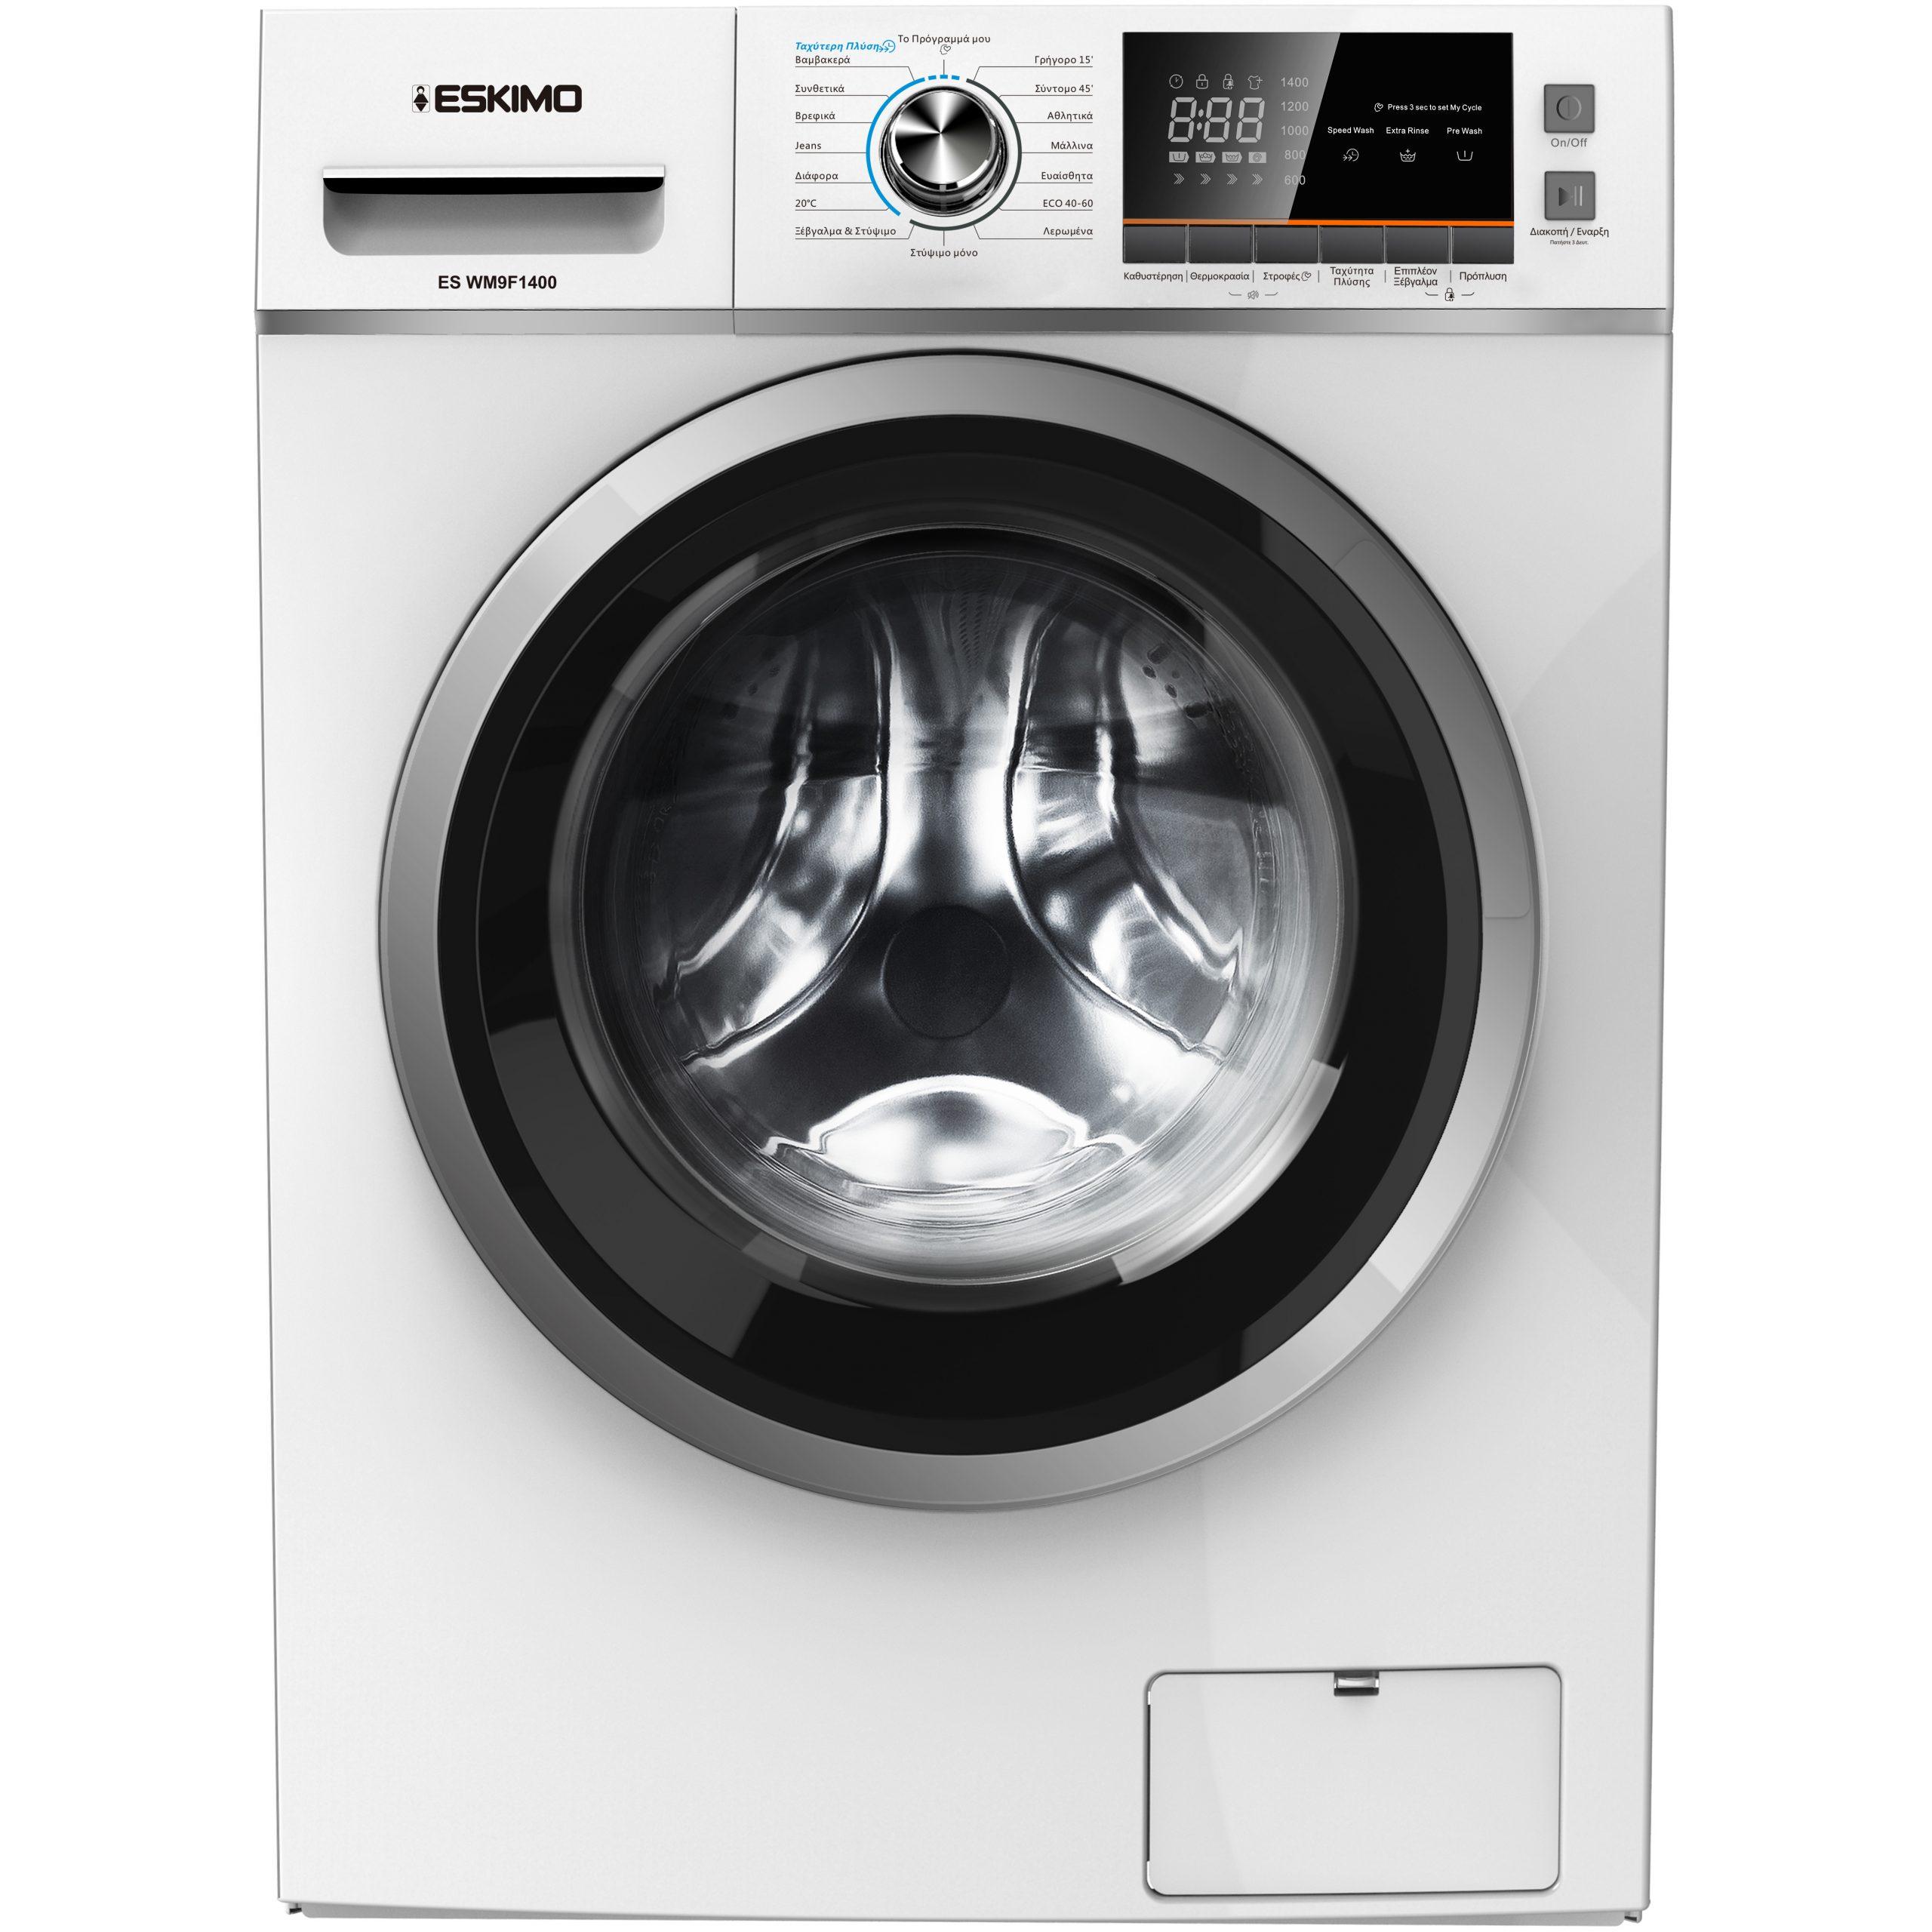 Eskimo Πλυντήριο Ρούχων ES WM9F1400